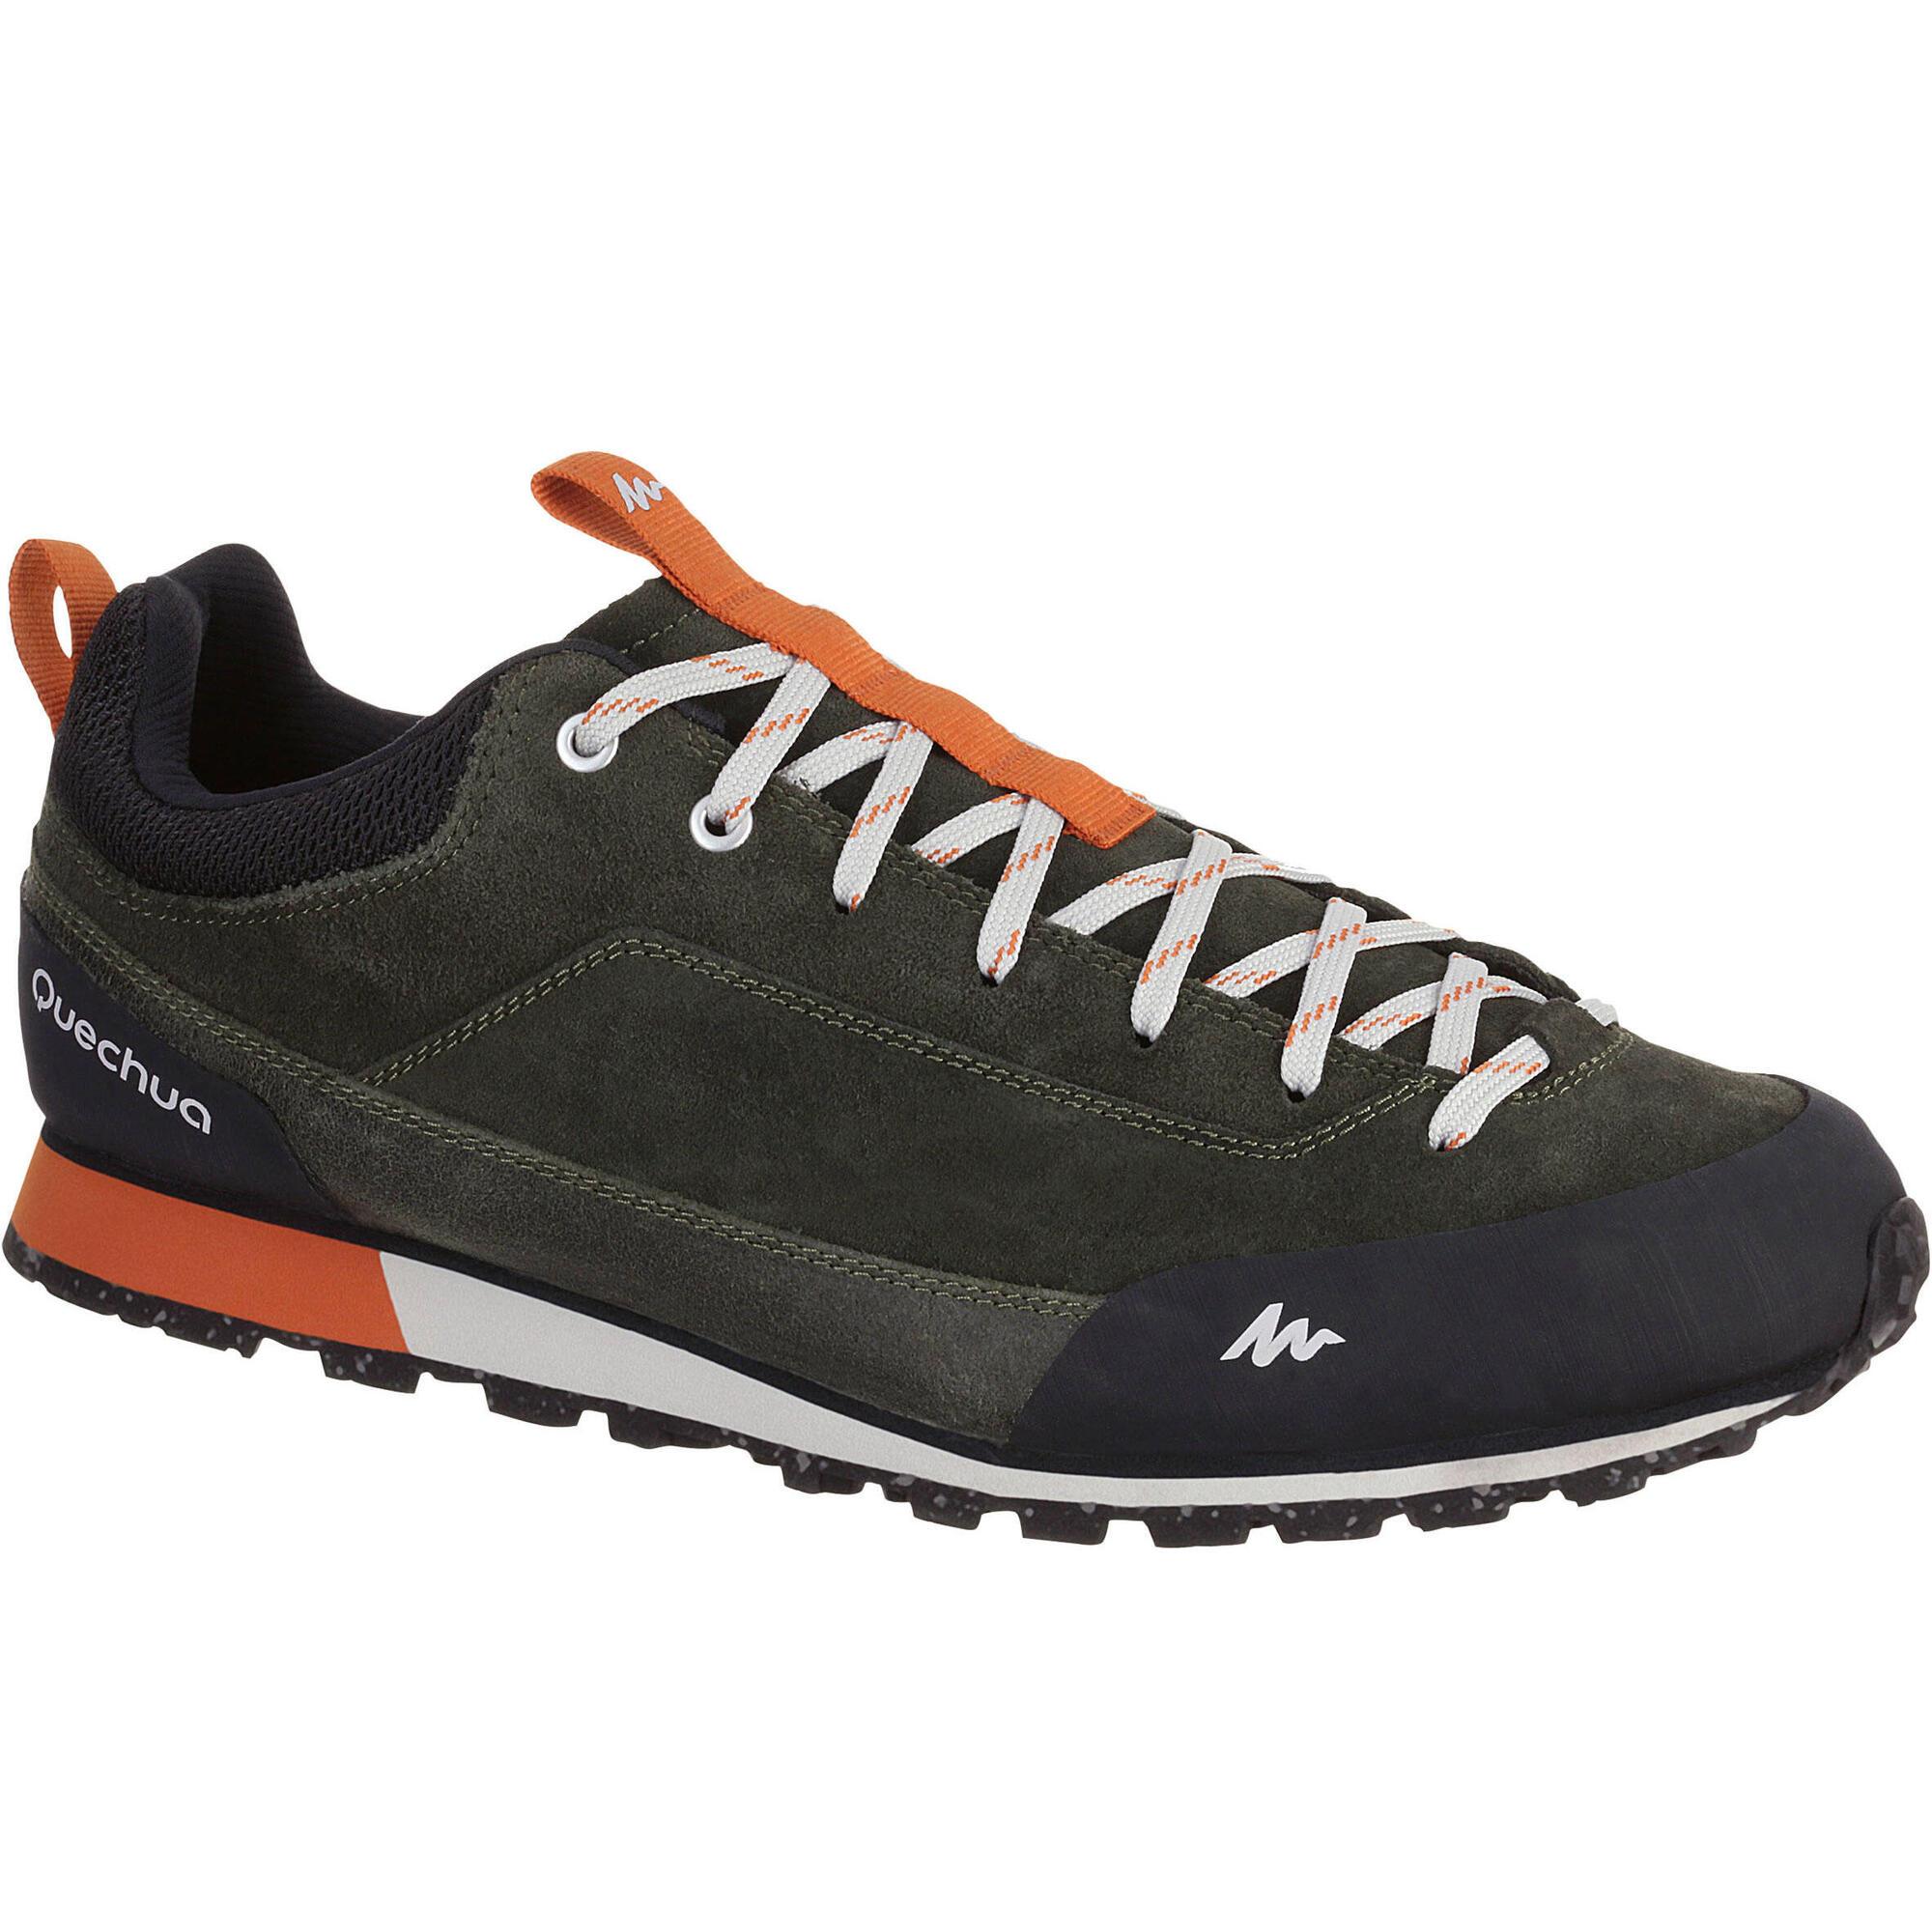 on sale 20f63 29582 Chaussures De debate wXq6z6I8 at Design Decathlon Securite Maison qExfw8